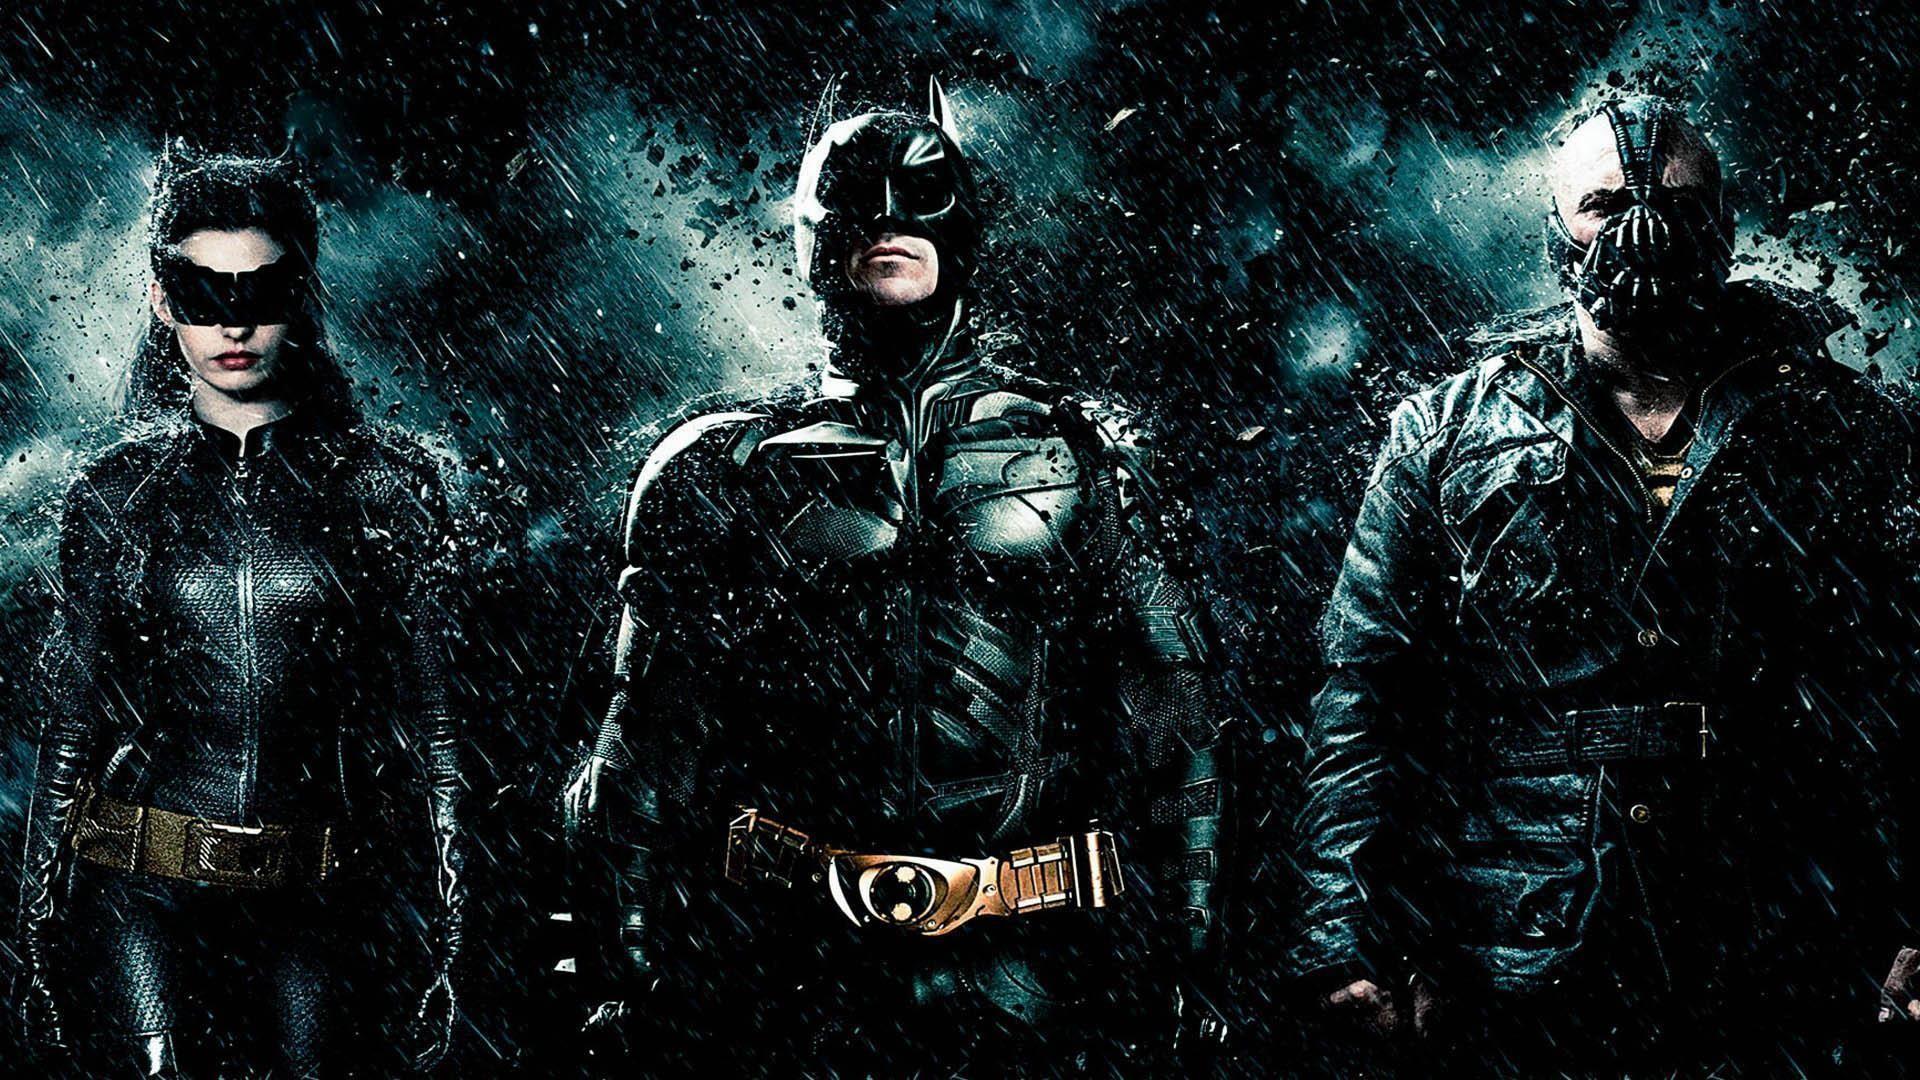 30 Batman HD Wallpapers for Desktop